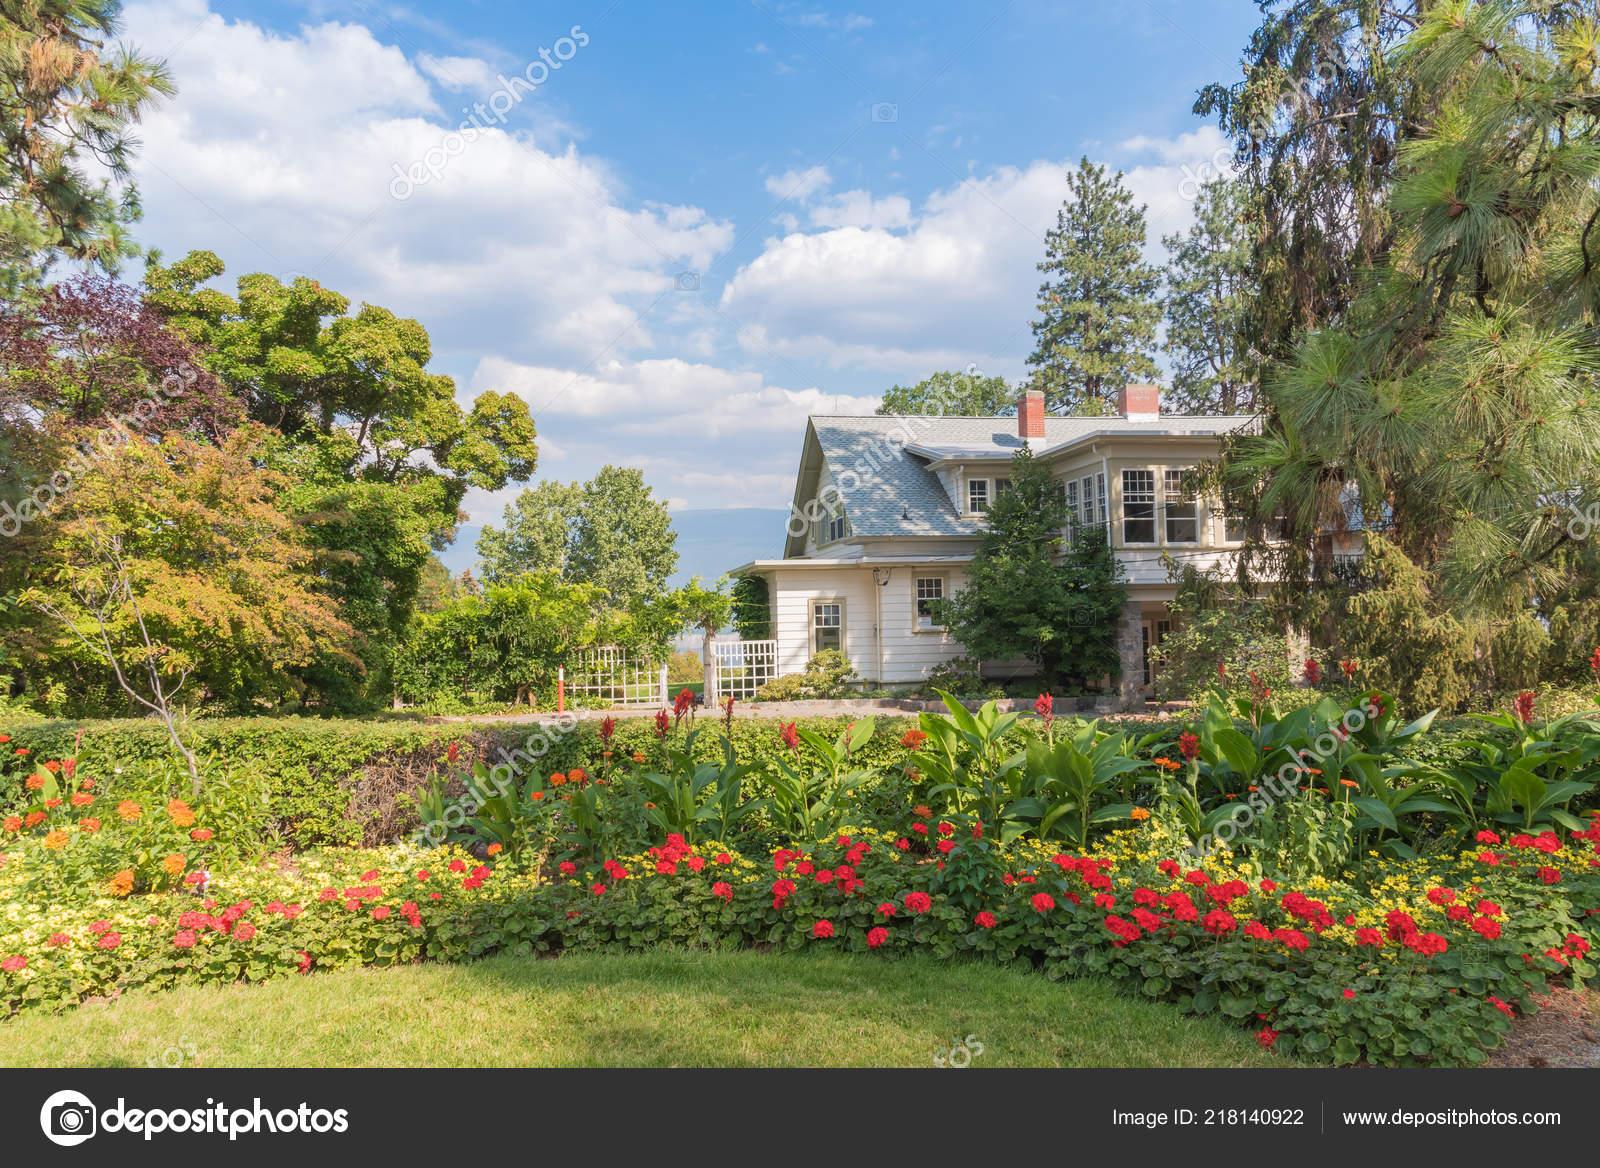 Summerland British Columbia Canada September 2018 Historic